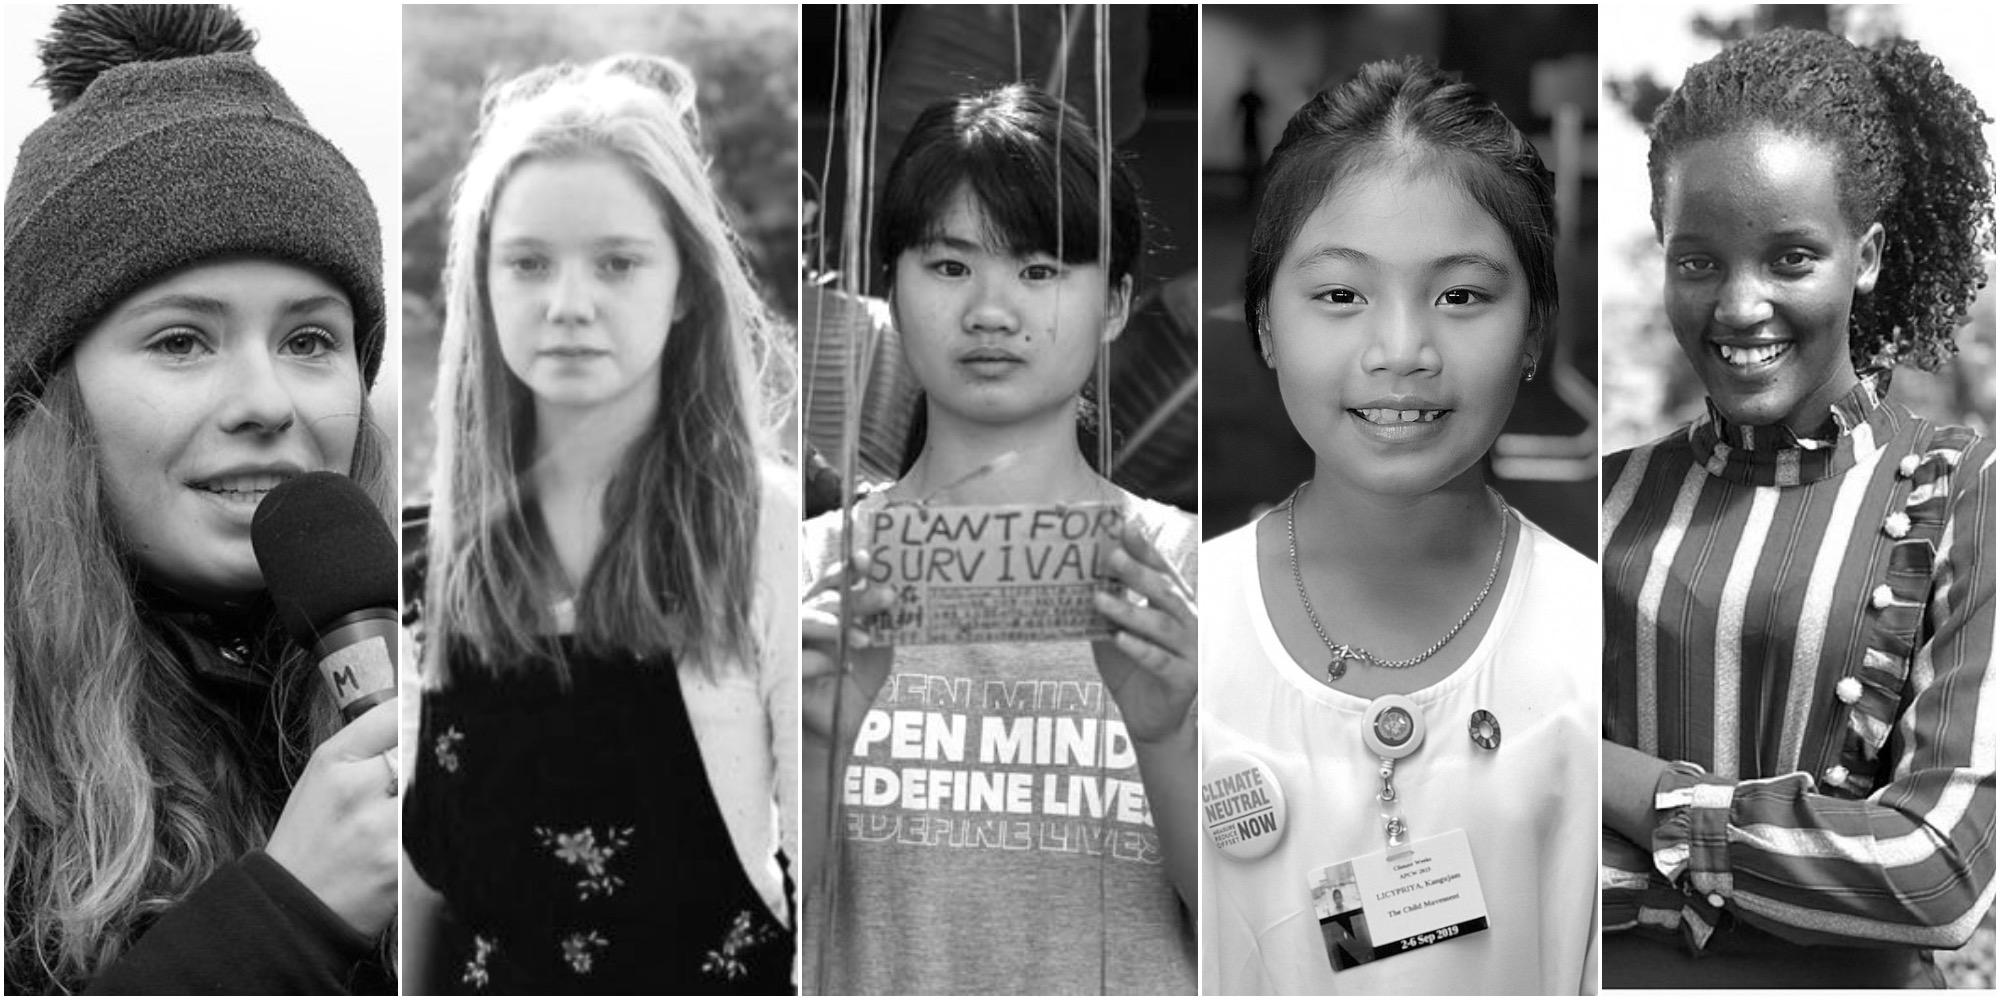 Greta-generationens frontkæmpere